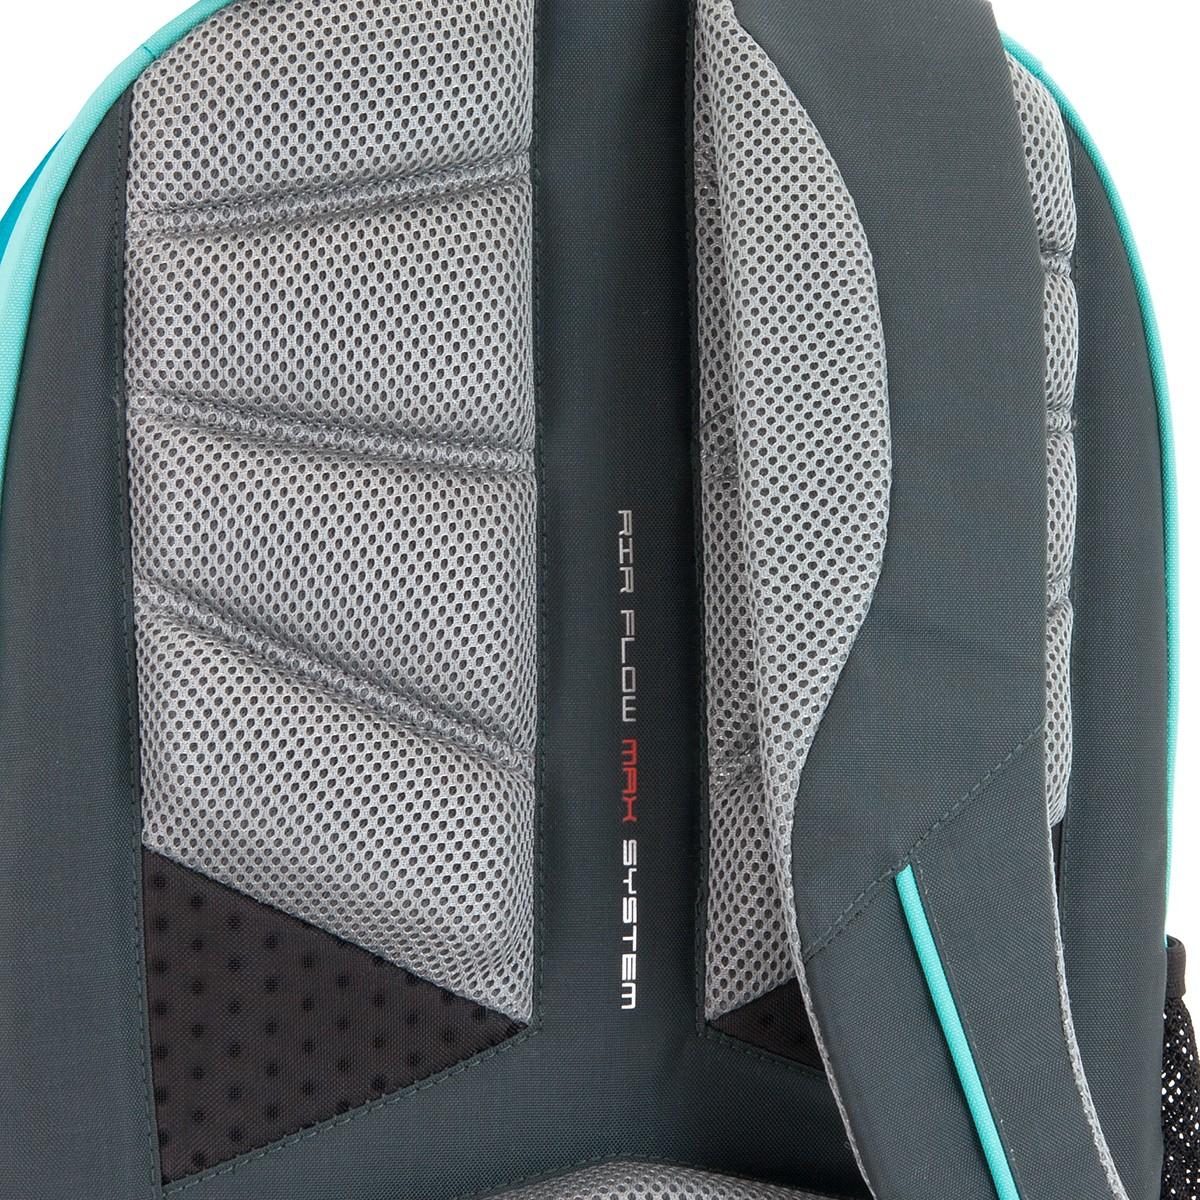 ... ARS UNA 10 ergonomikus hátizsák 00496d62c3